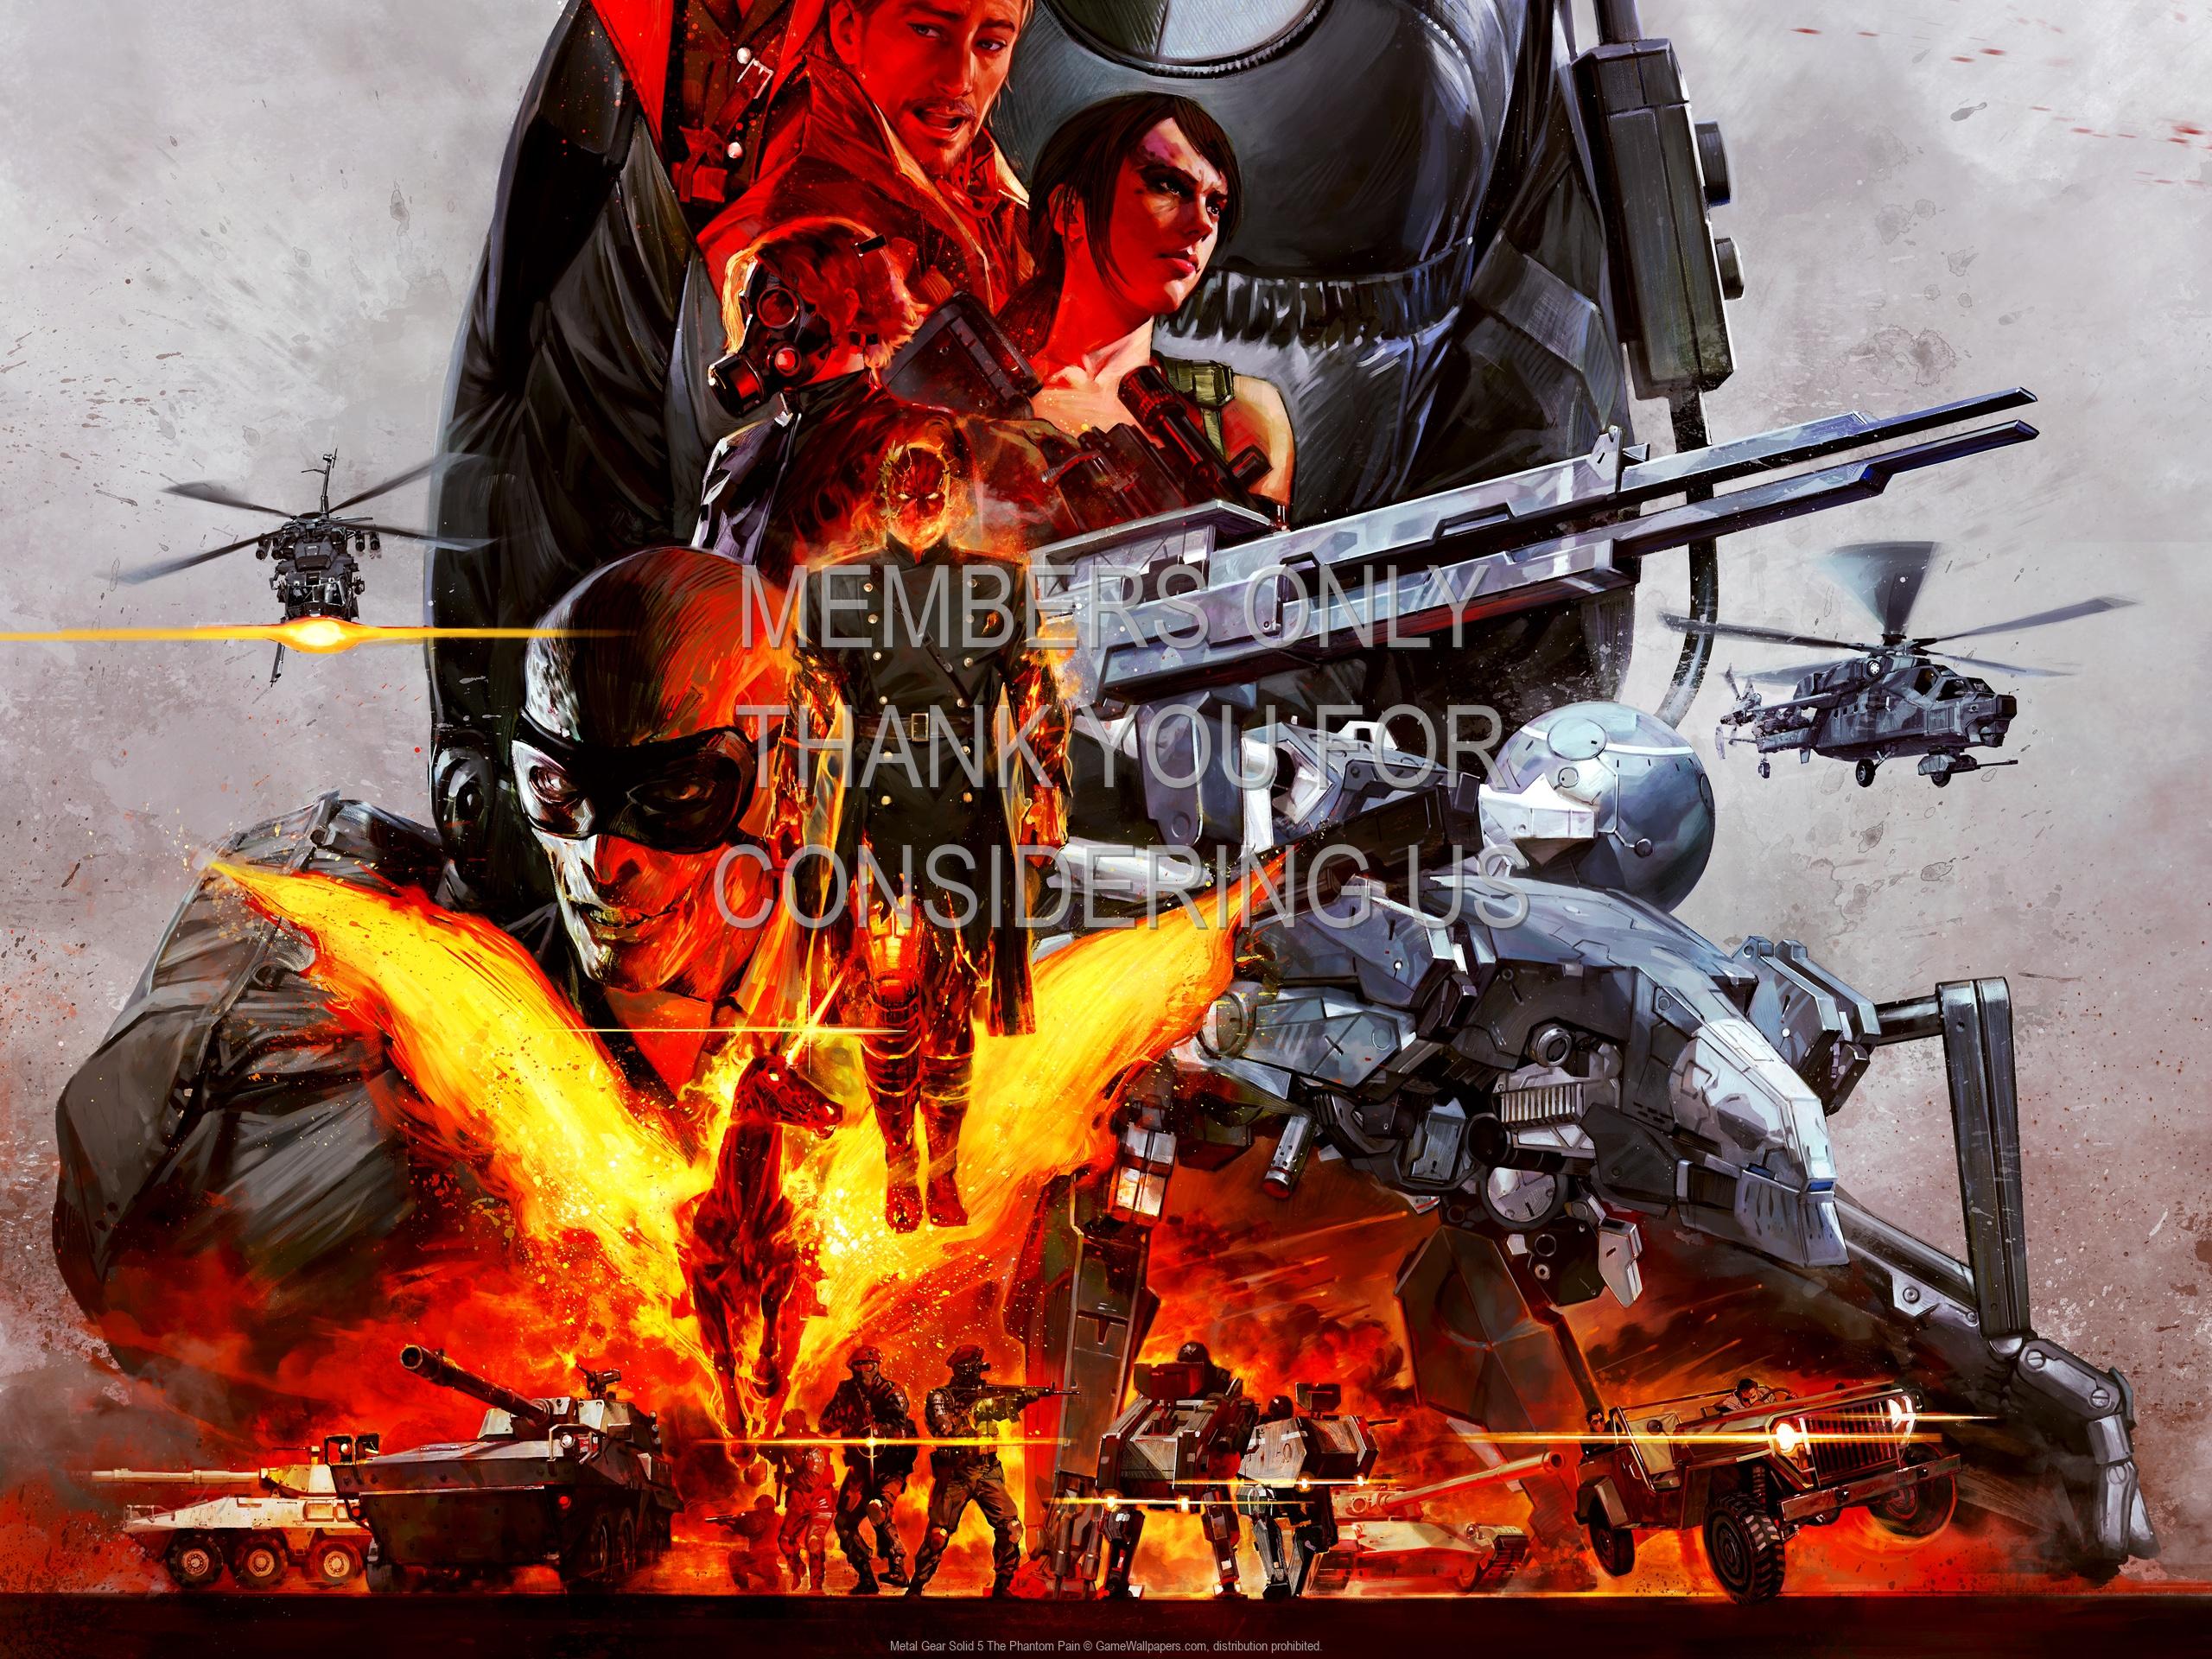 Metal Gear Solid 5 The Phantom Pain Wallpaper 02 1920x1080